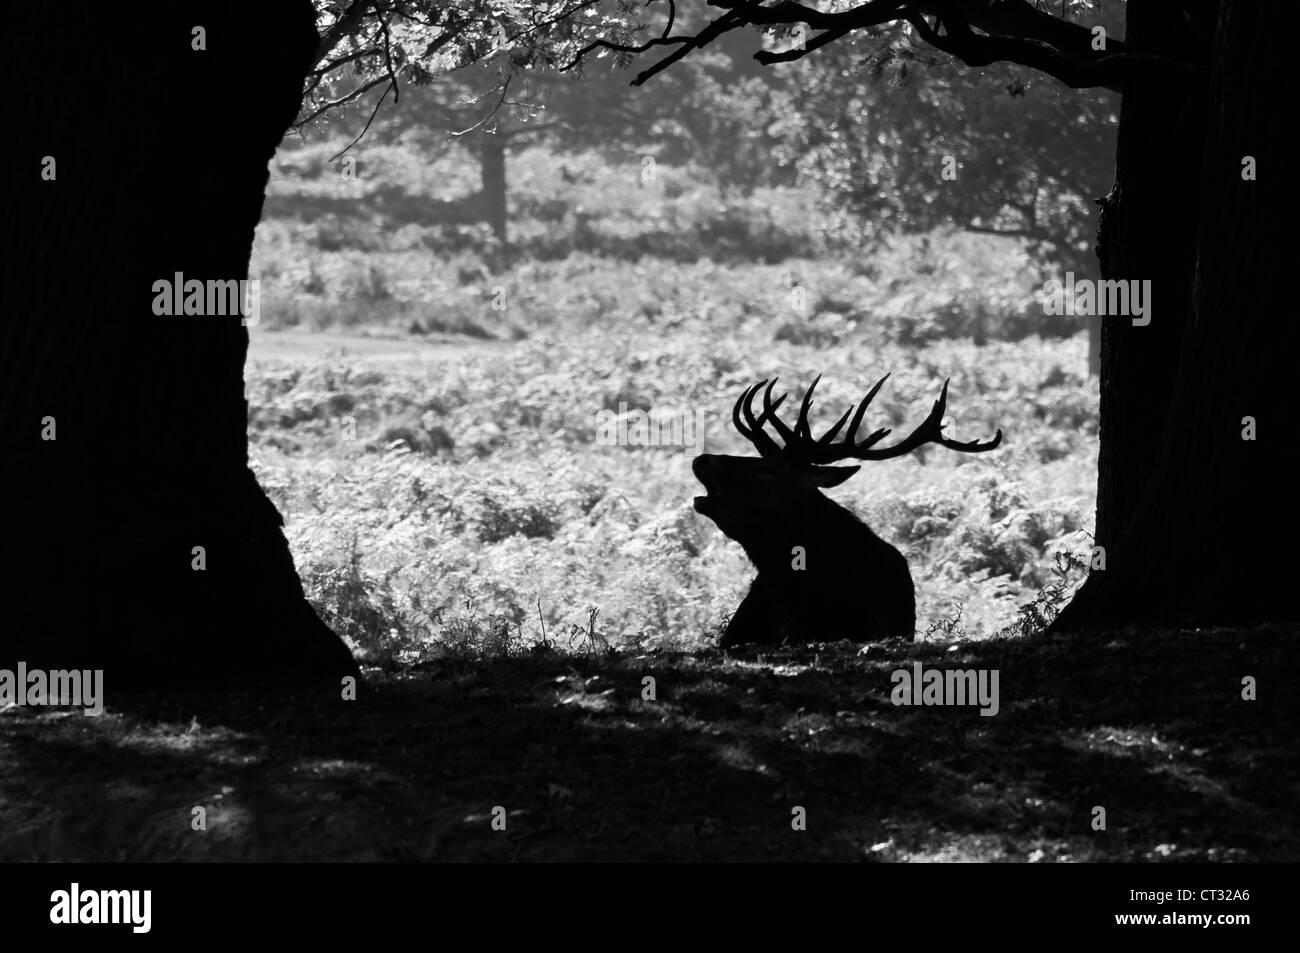 deer antlers black and white stockfotos deer antlers black and white bilder alamy. Black Bedroom Furniture Sets. Home Design Ideas